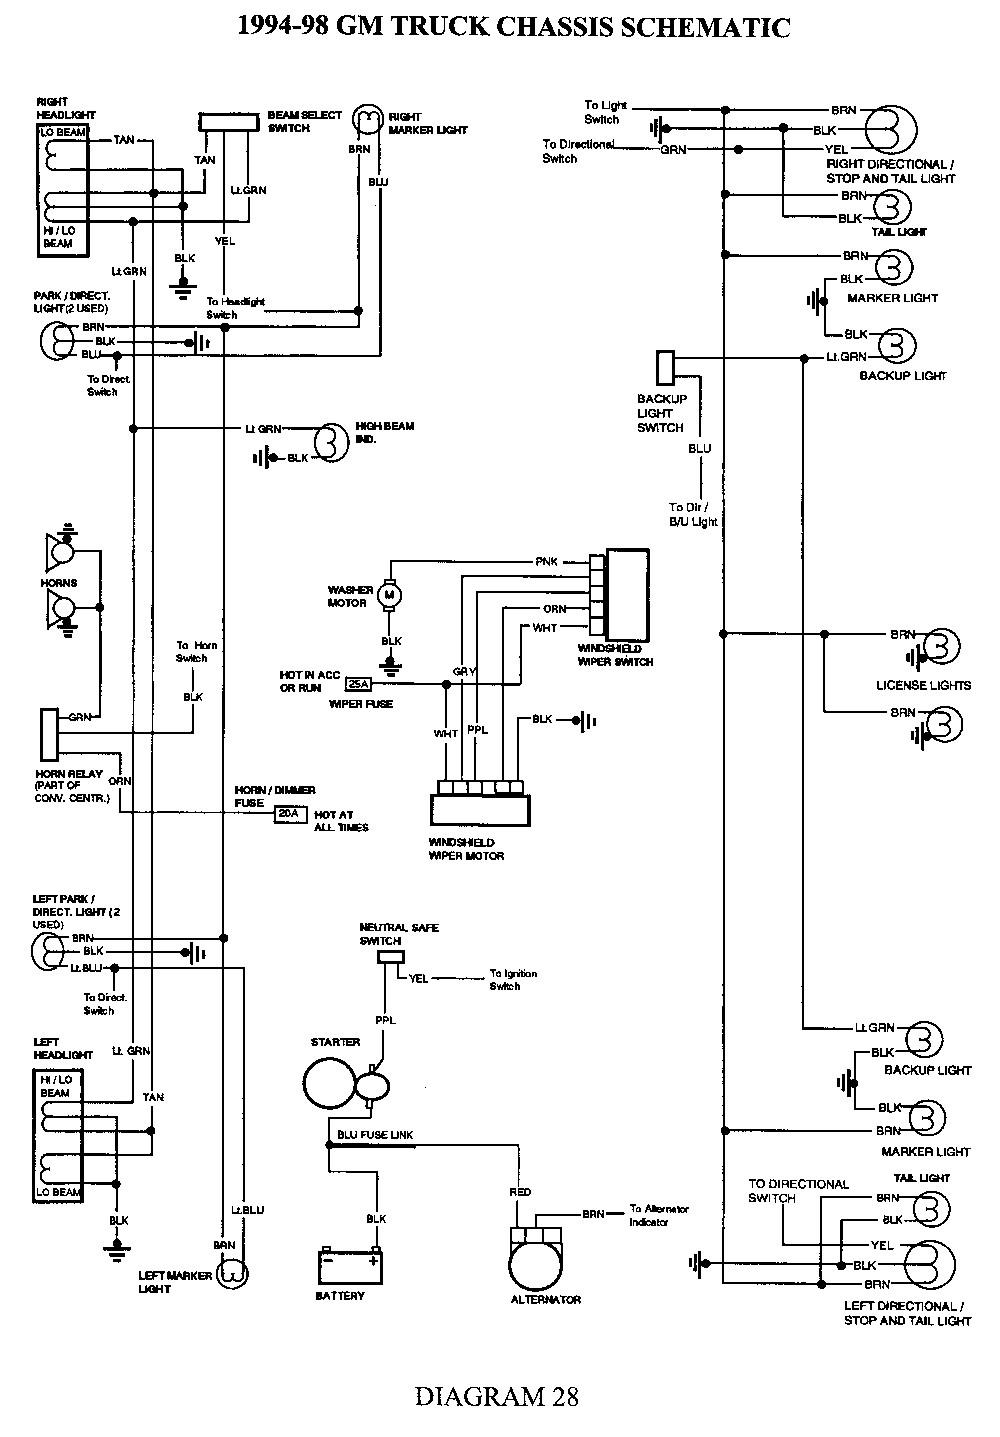 WRG-1635] Jeep J10 Tail Light Wiring Diagram on